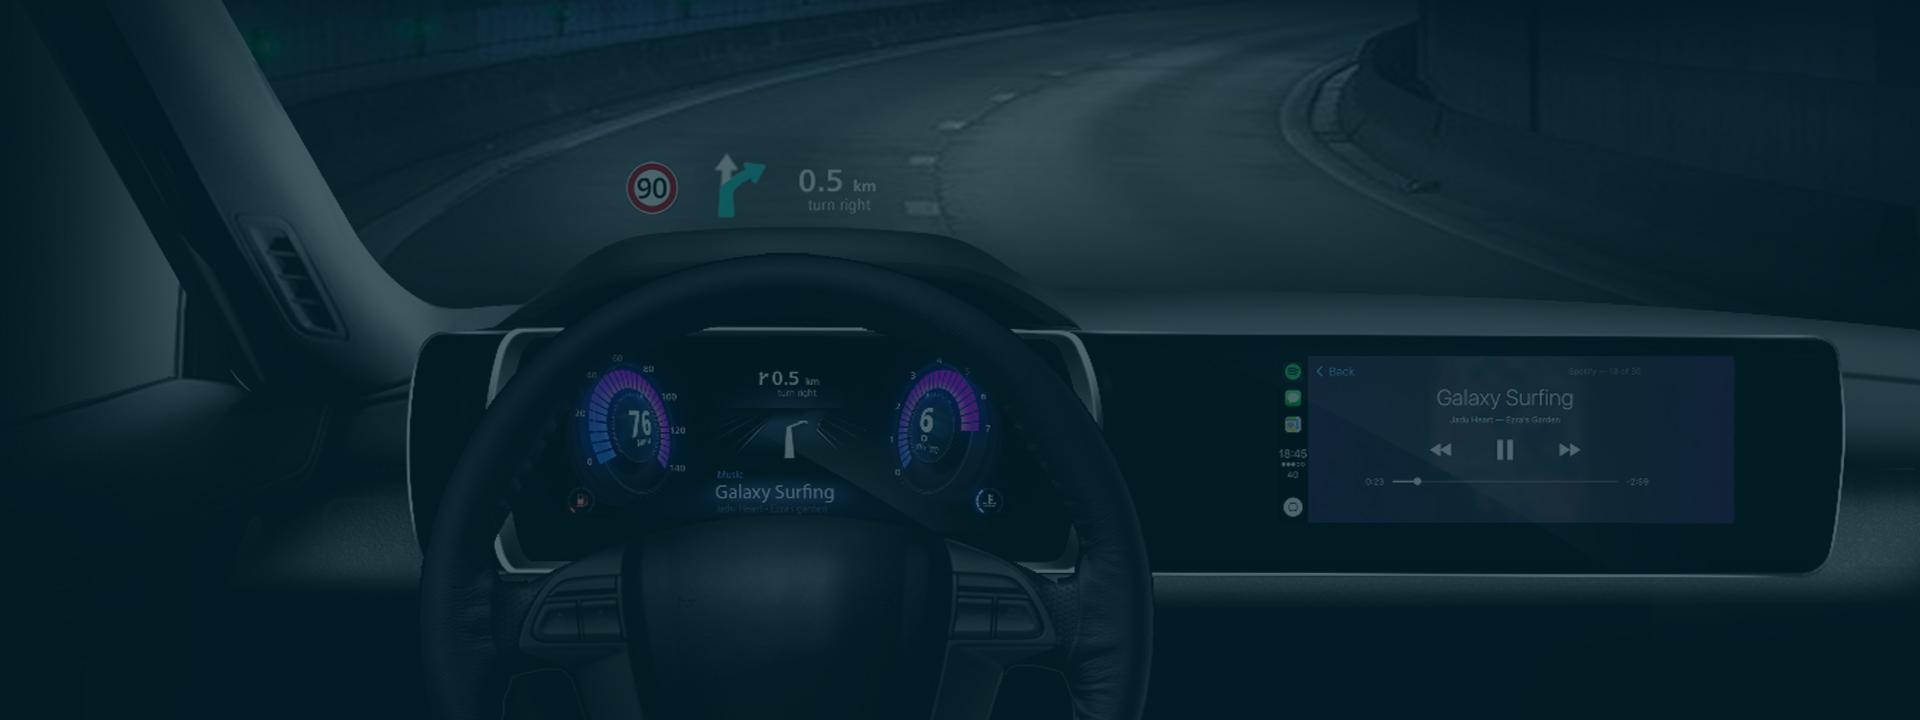 smartcore-cluster-infotainment-head-up-display-visteon-human-machine-interface-example